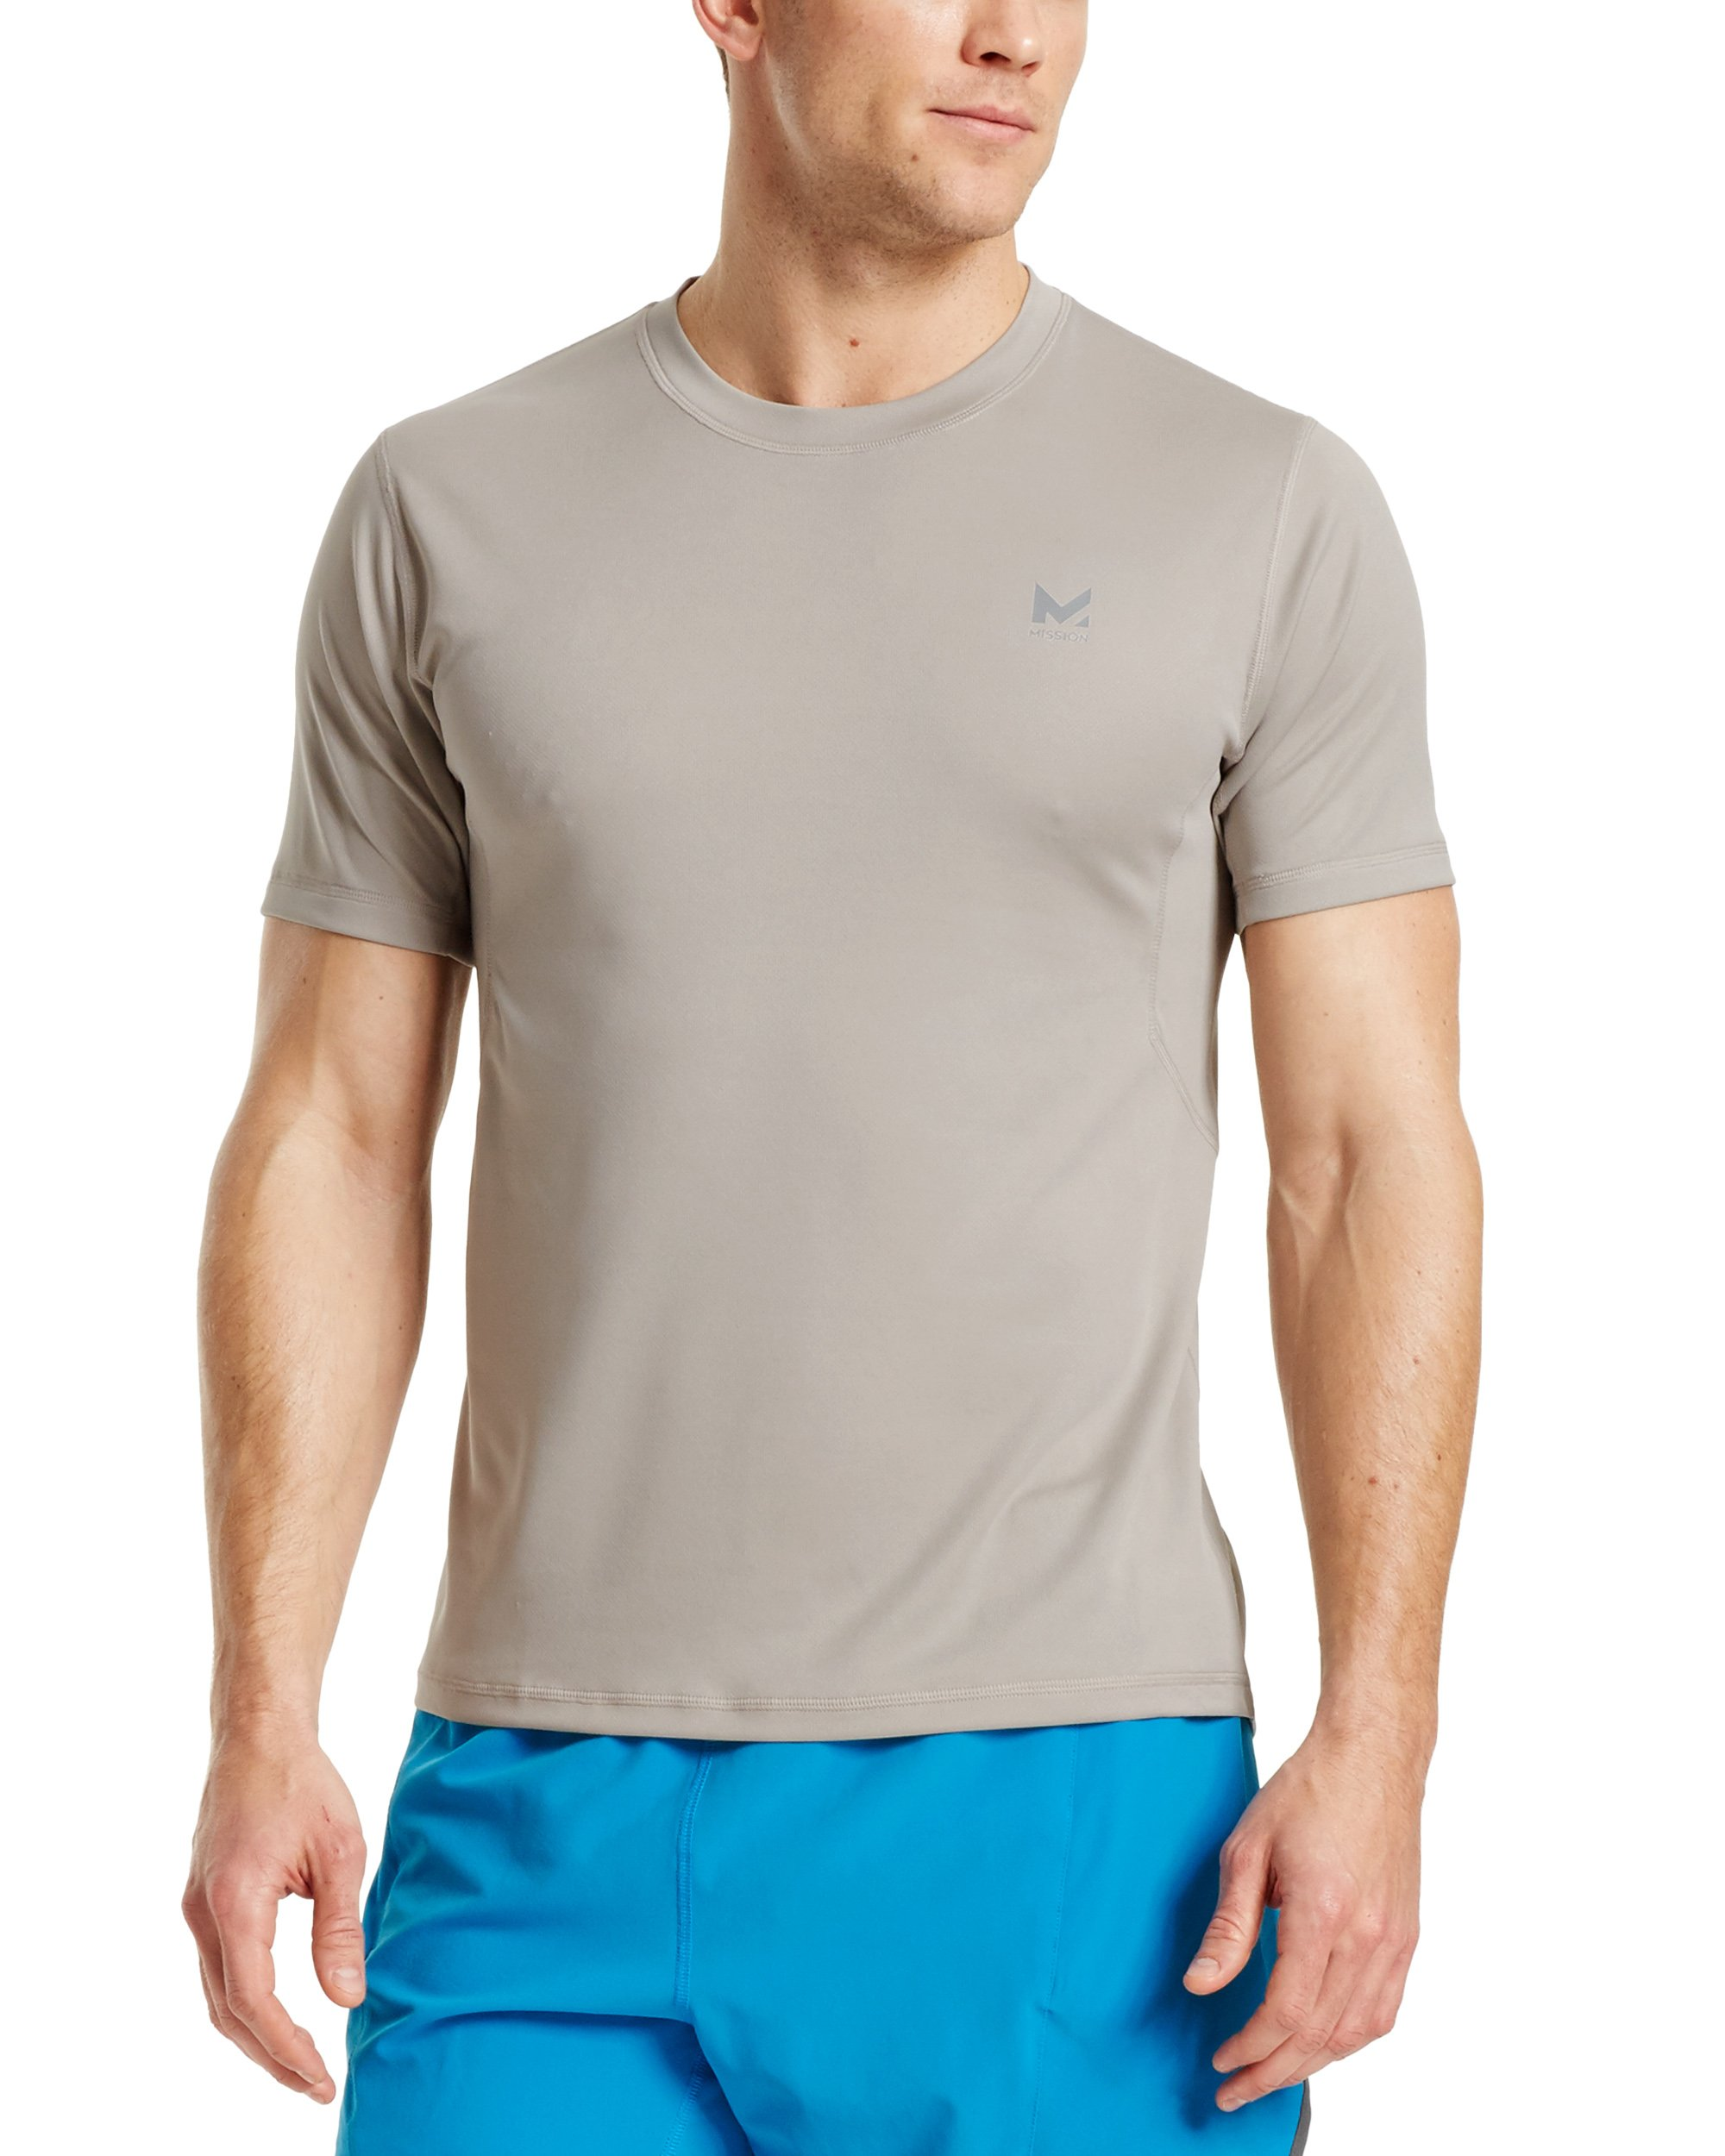 MISSION Men's VaporActive Alpha Short Sleeve